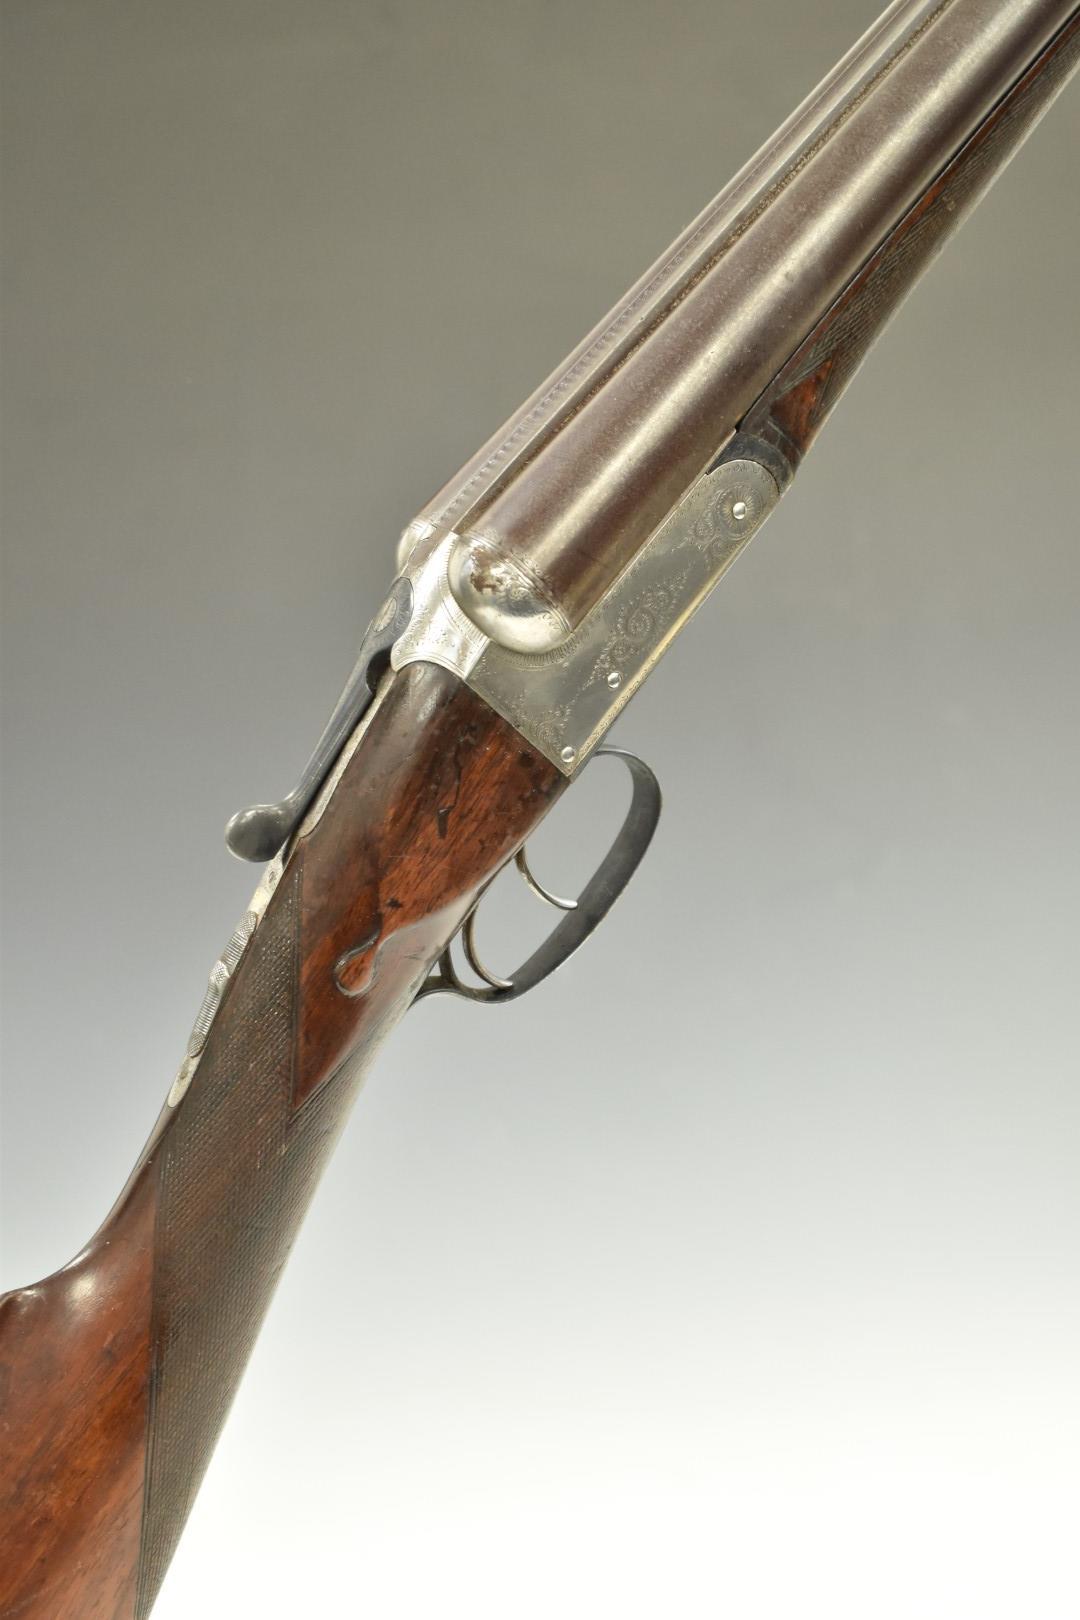 William P Jones 12 bore side by side shotgun with engraved lock, trigger guard, underside, fences,